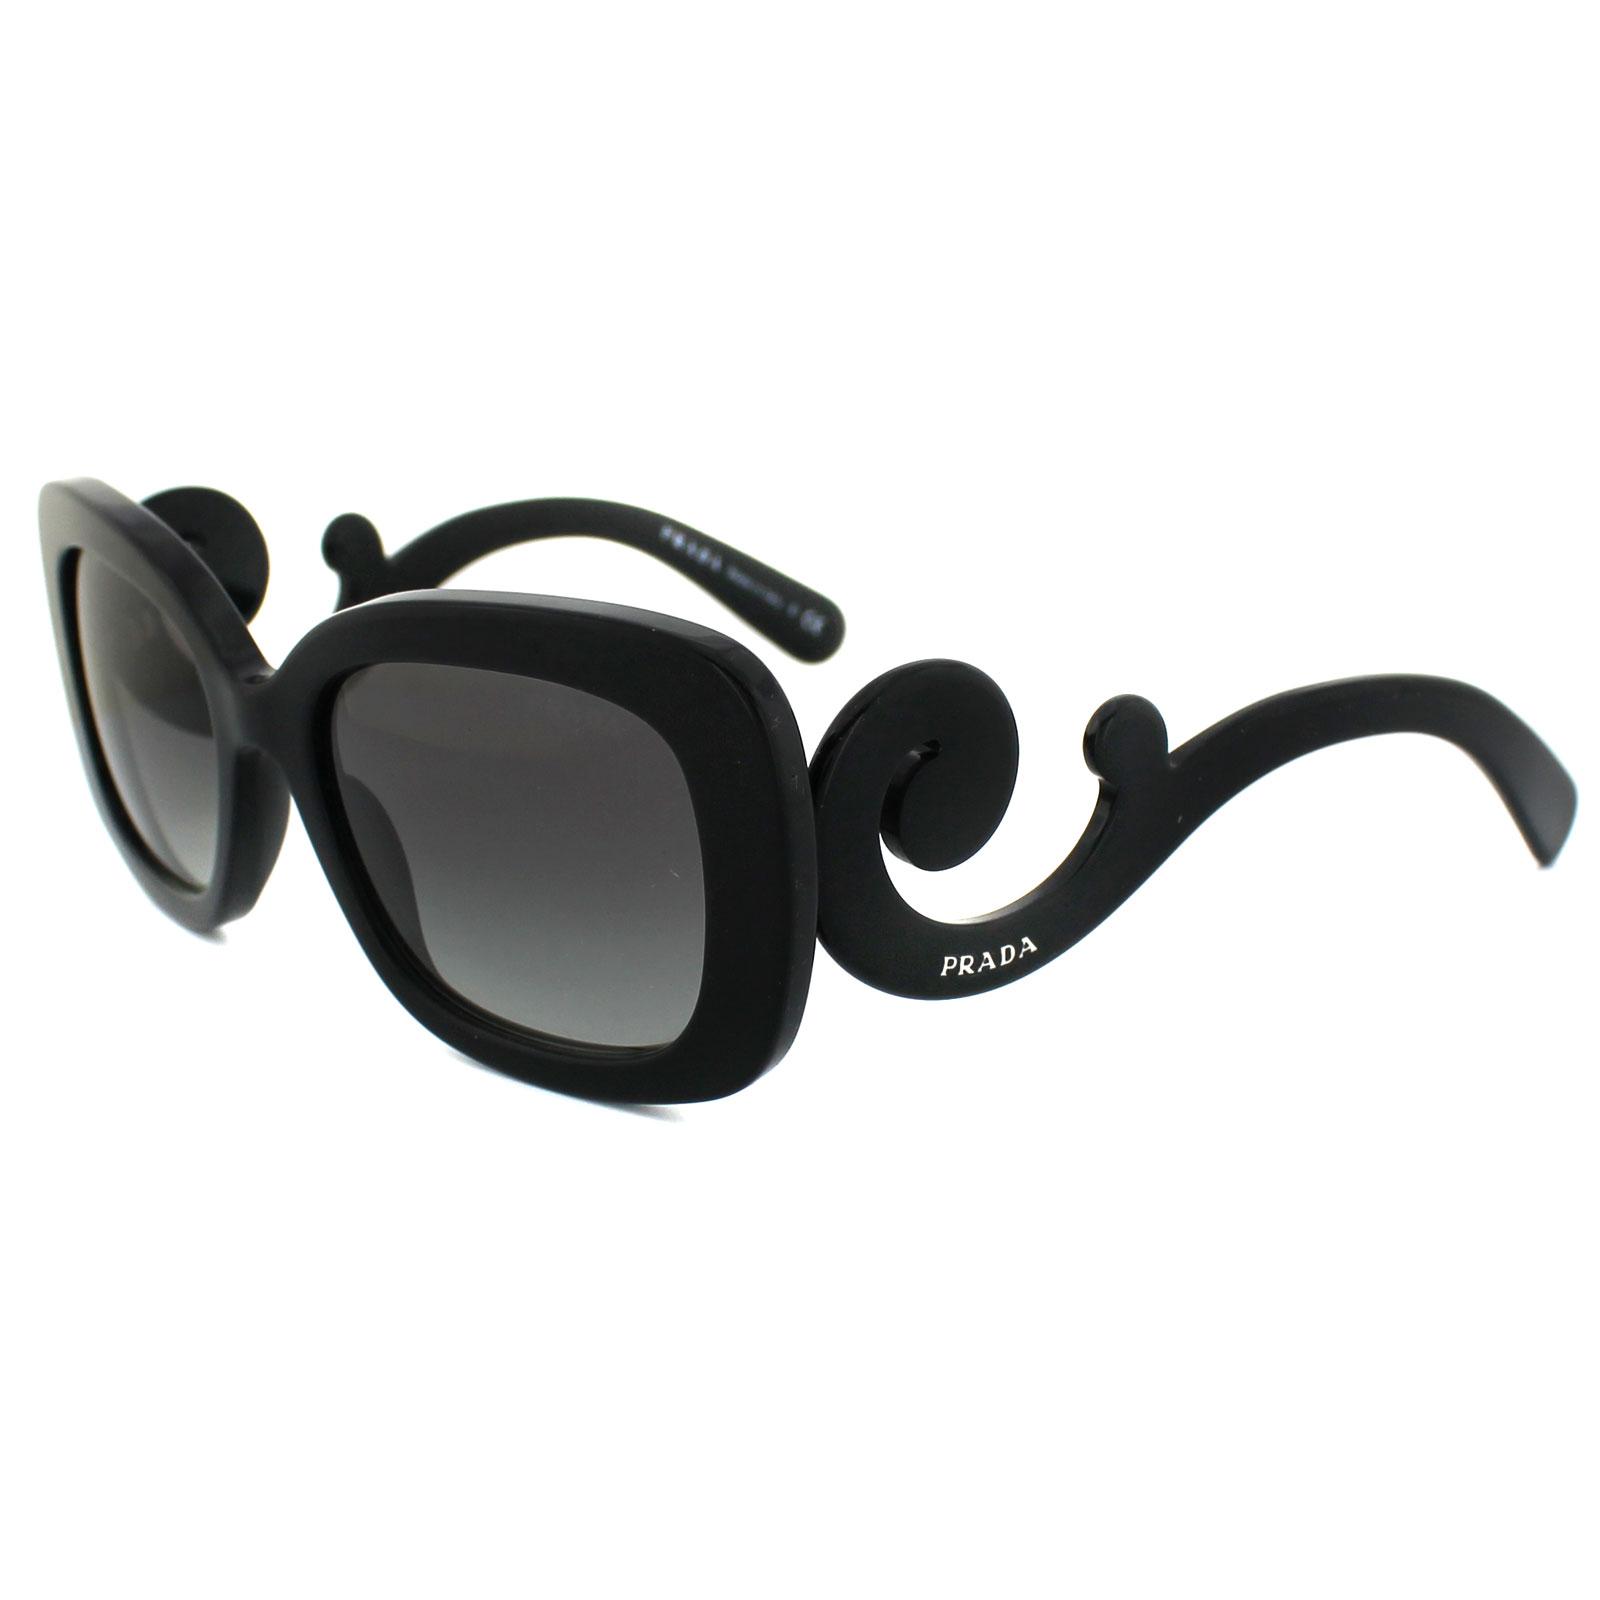 0d0255a01 Prada Sunglasses 27OS 1AB3M1 Black Grey Gradient 679420547664 | eBay